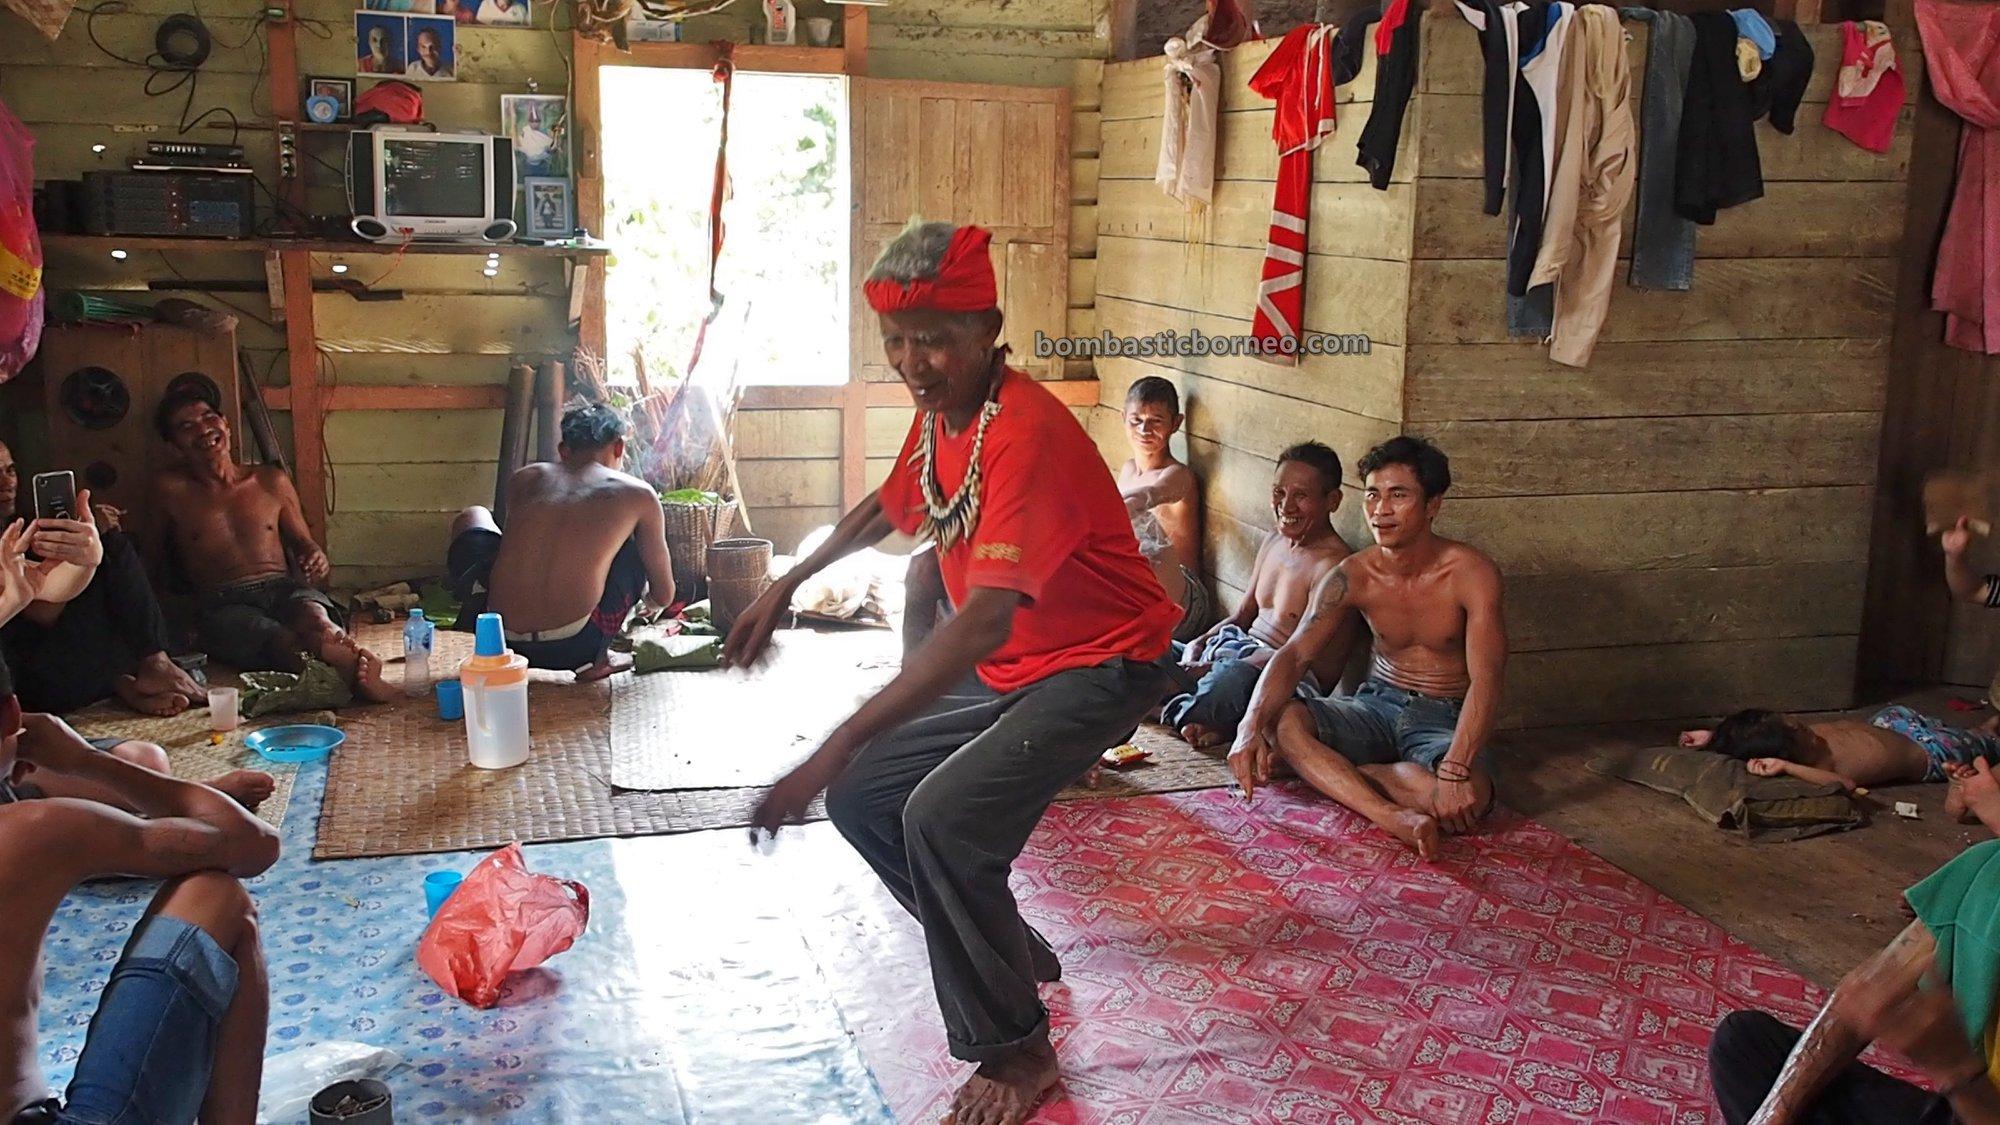 Gawai Nyobeng, thanksgiving, backpackers, Culture, West Kalimantan, Bengkayang, Desa Bengkawan, Ethnic, village, Tourism, tourist attraction, Travel guide, Trans Borneo, 婆罗洲达雅丰收节日, 印尼西加里曼丹, 孟加映传统文化